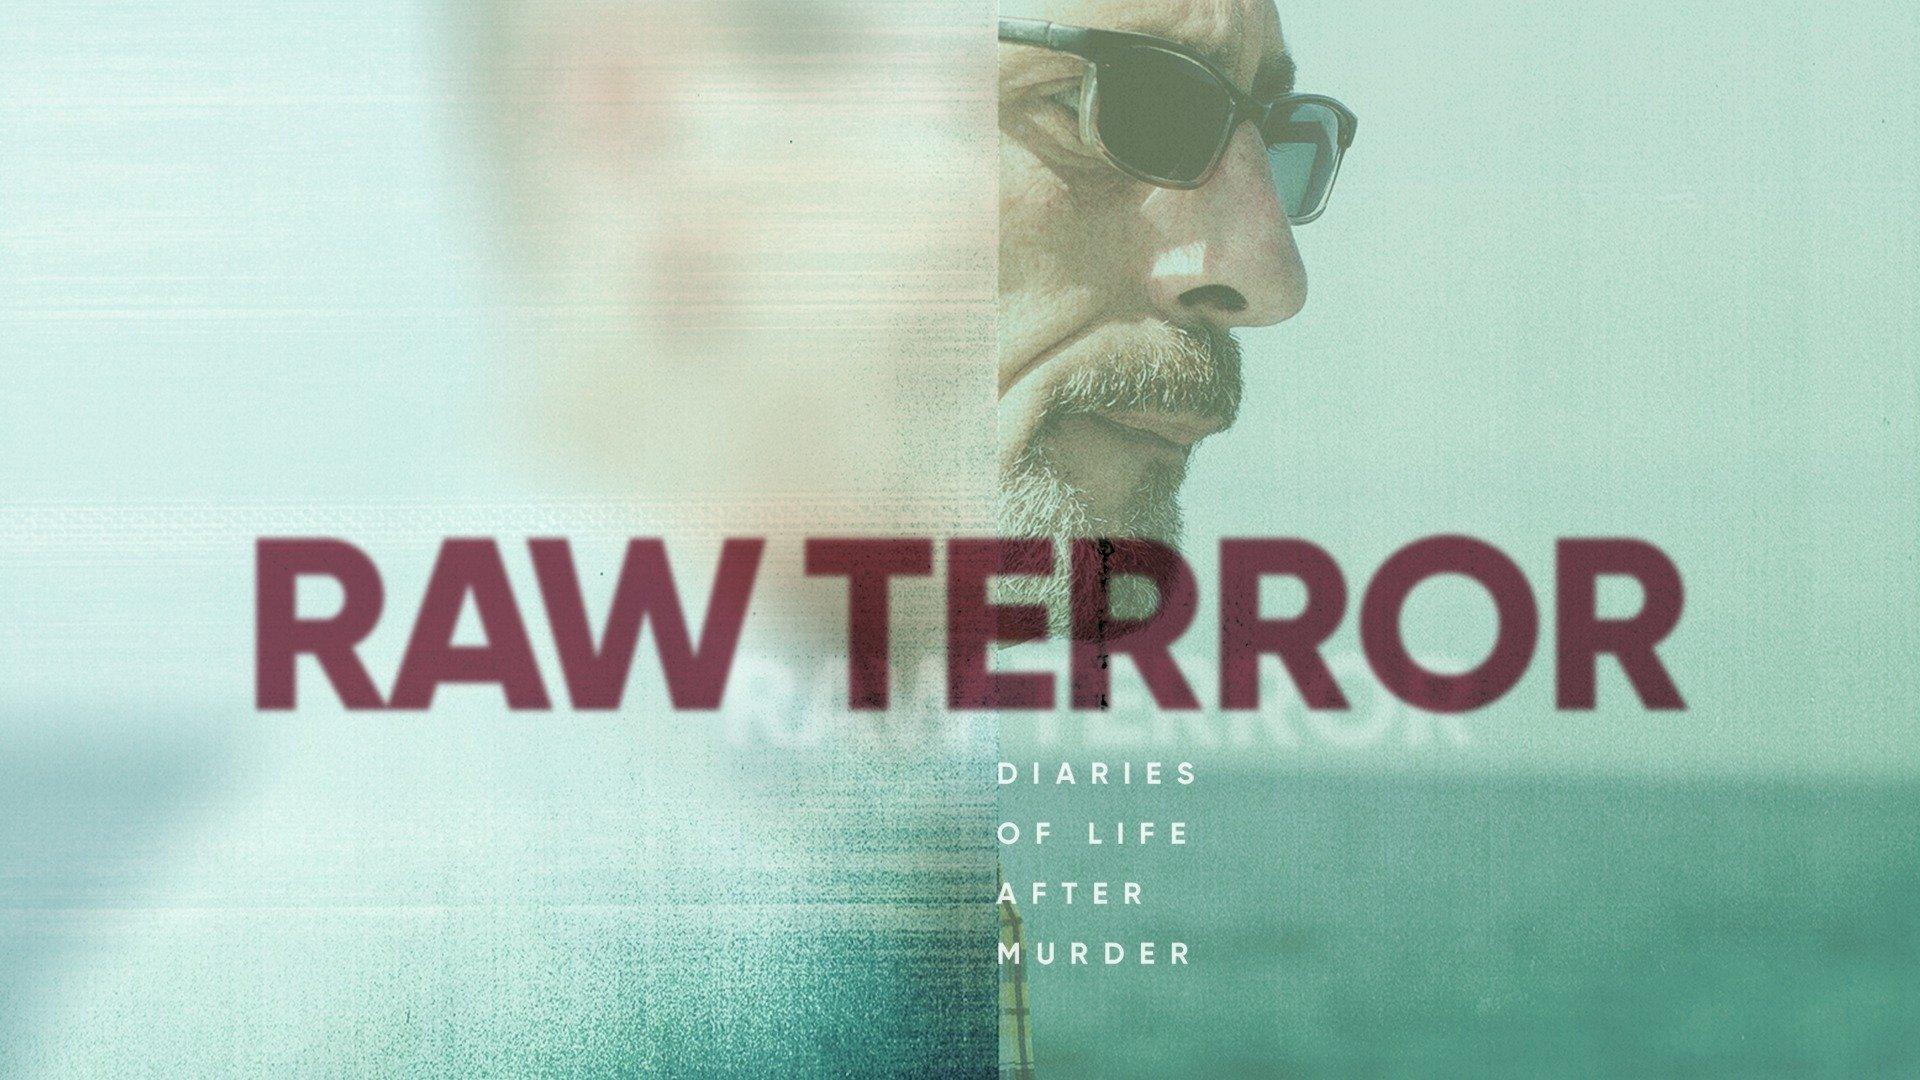 Raw Terror